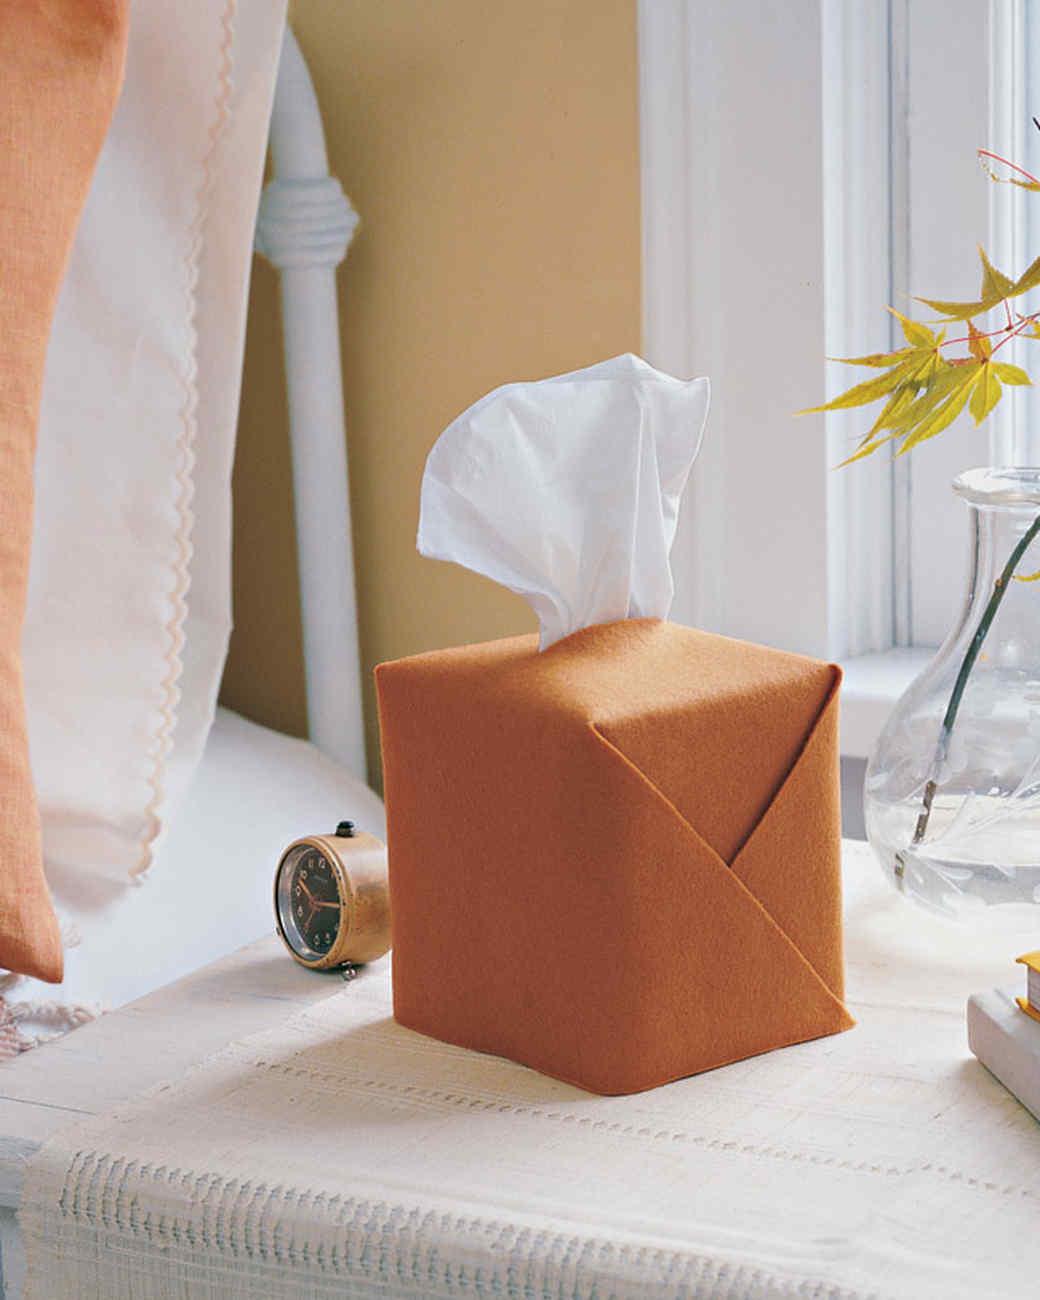 mla103704_1108_tissuebox.jpg